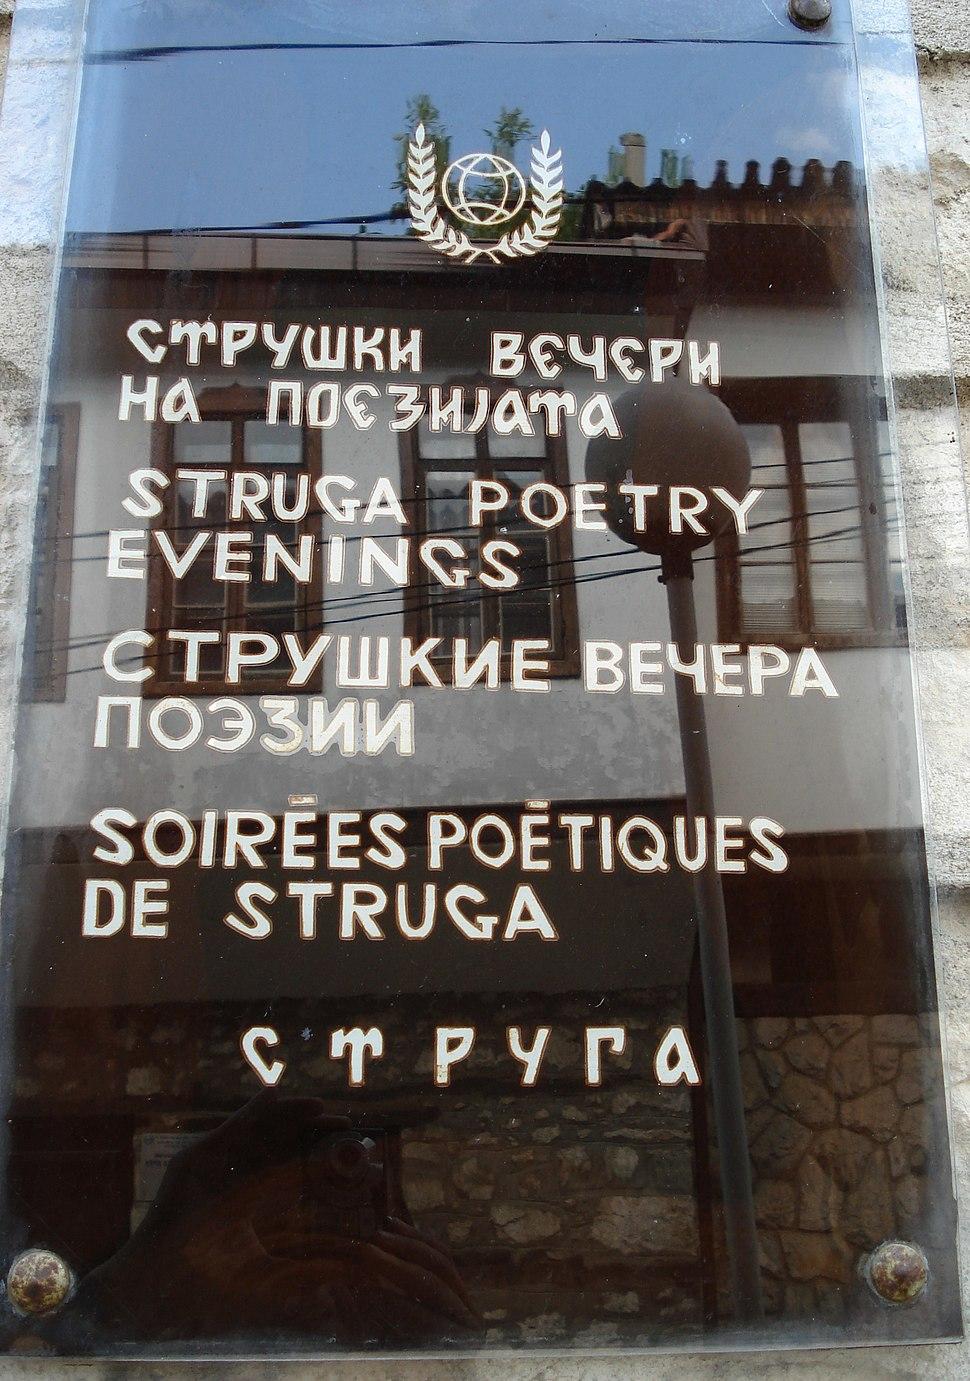 Struga Poetry Evenings Festival Macedonia 1